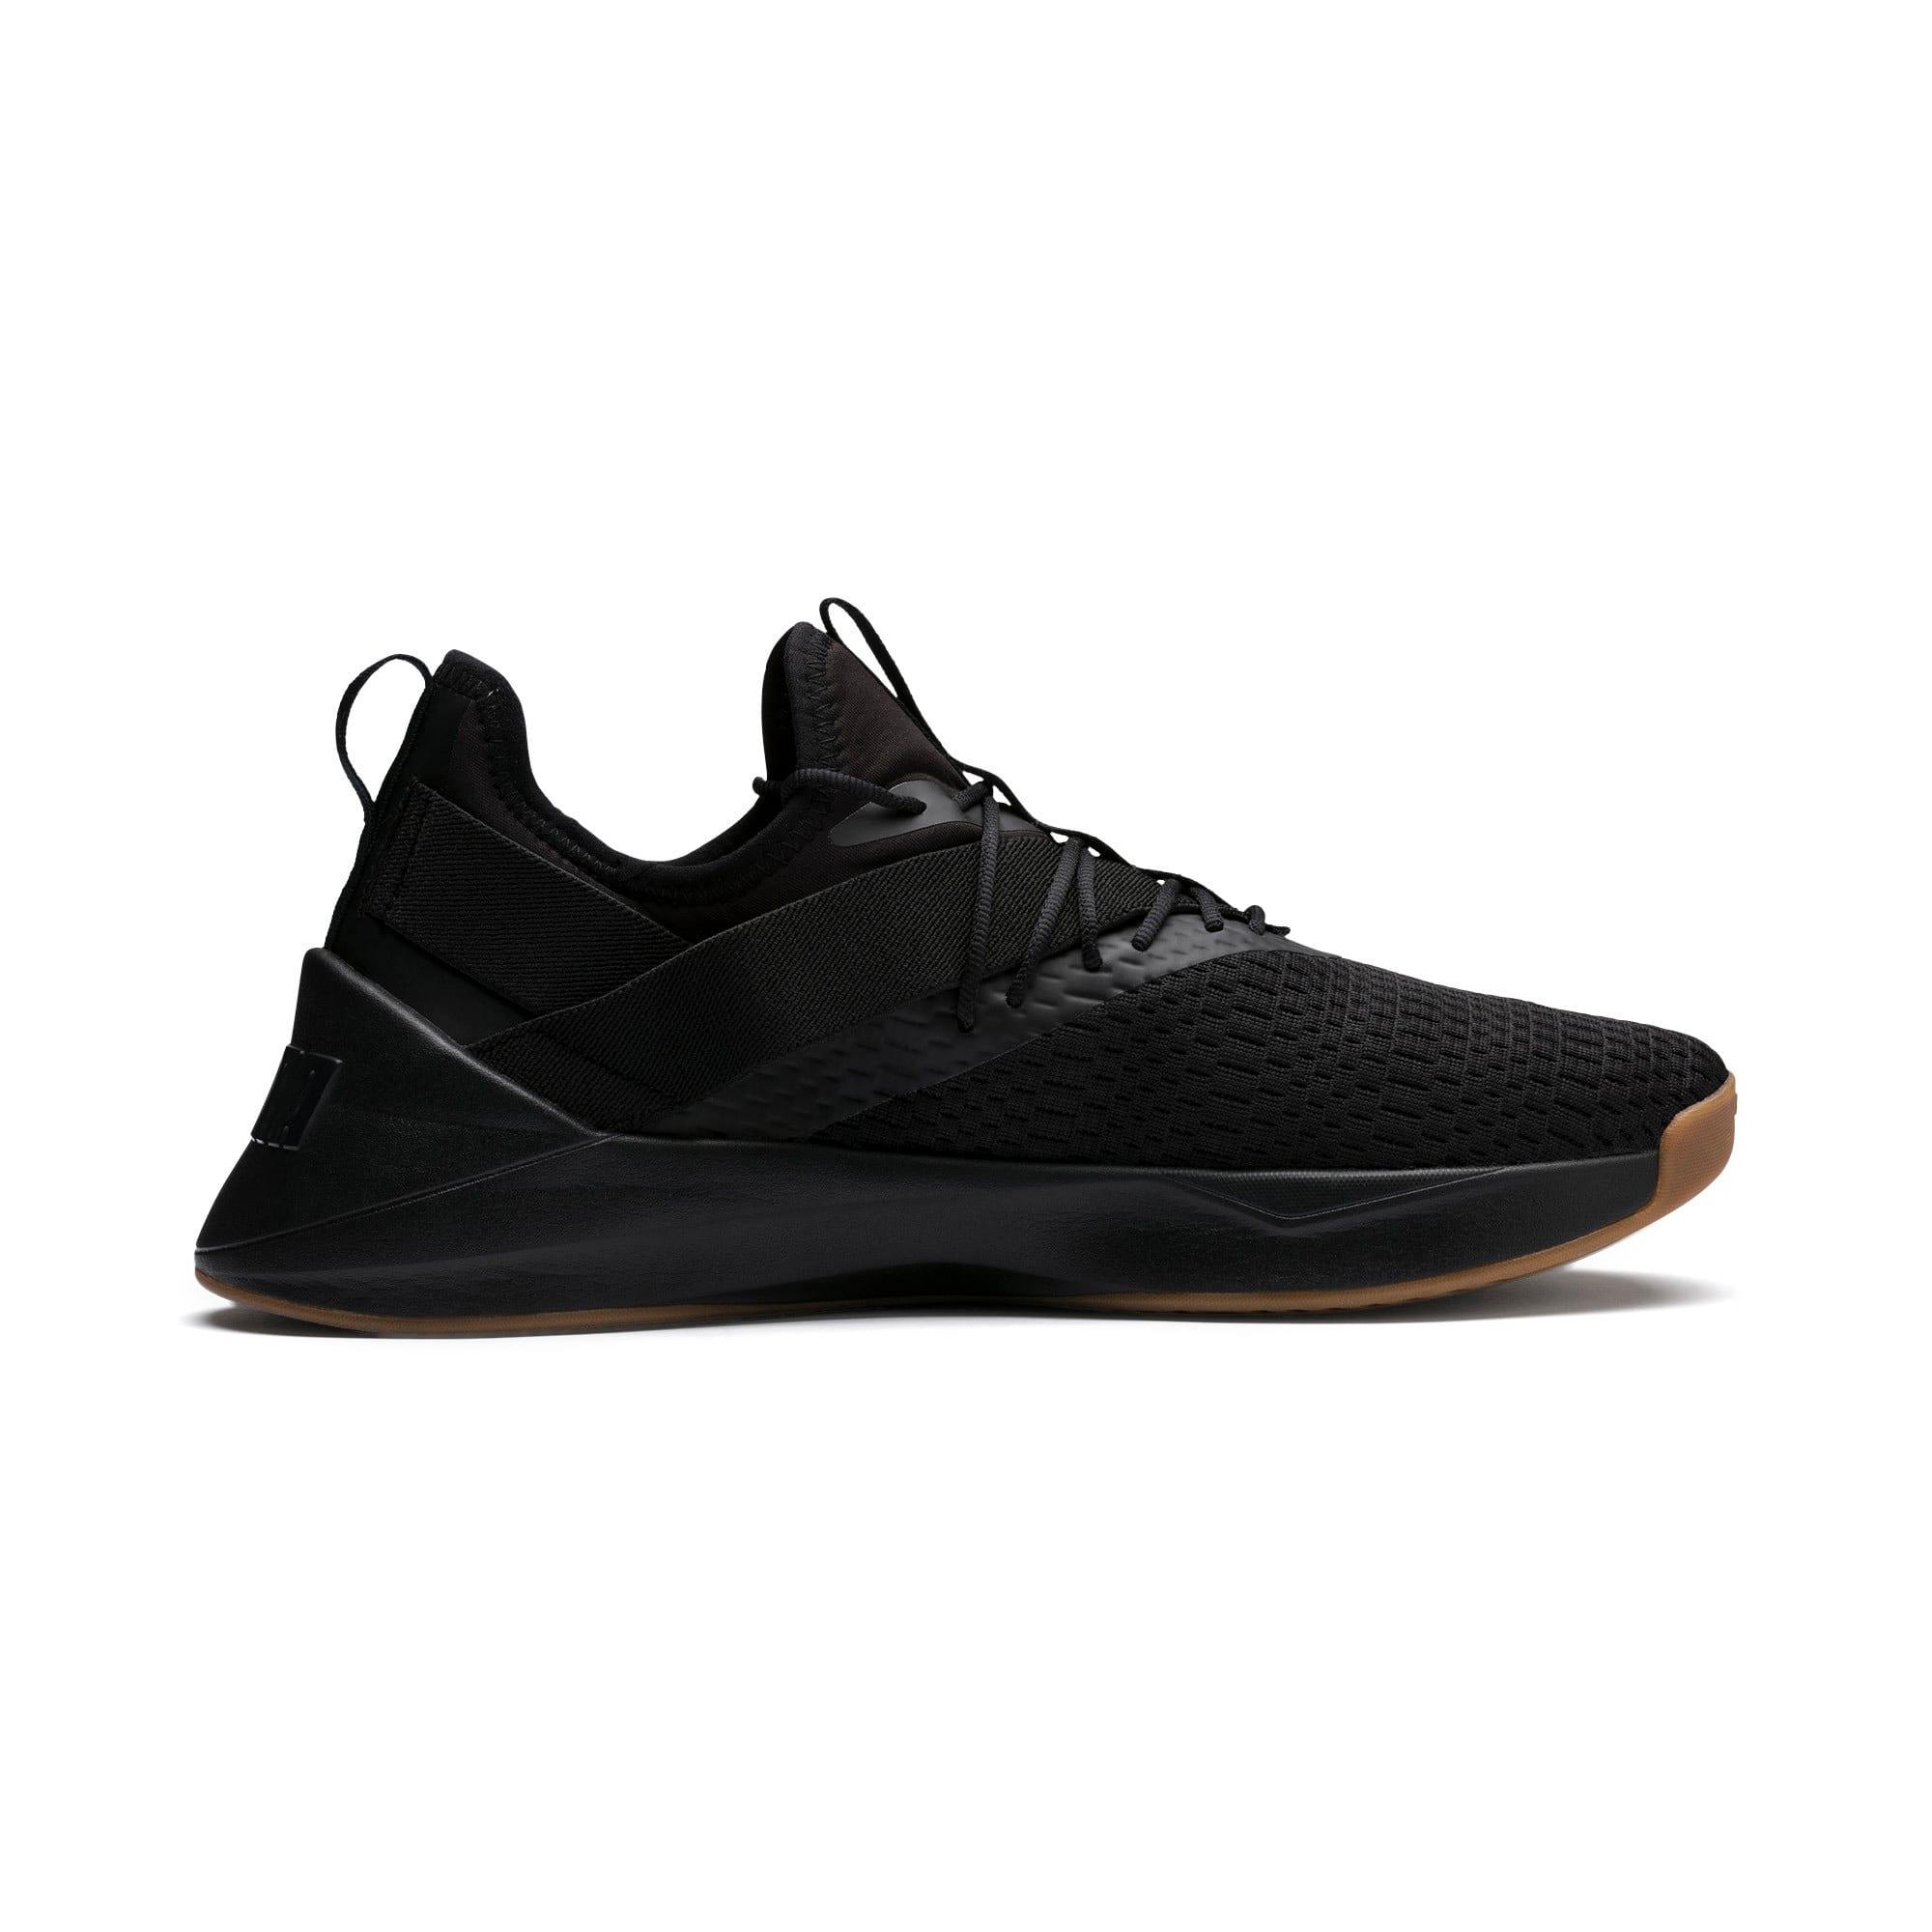 Thumbnail 5 of Jaab XT Summer Herren Sneaker, Puma Black-Asphalt, medium